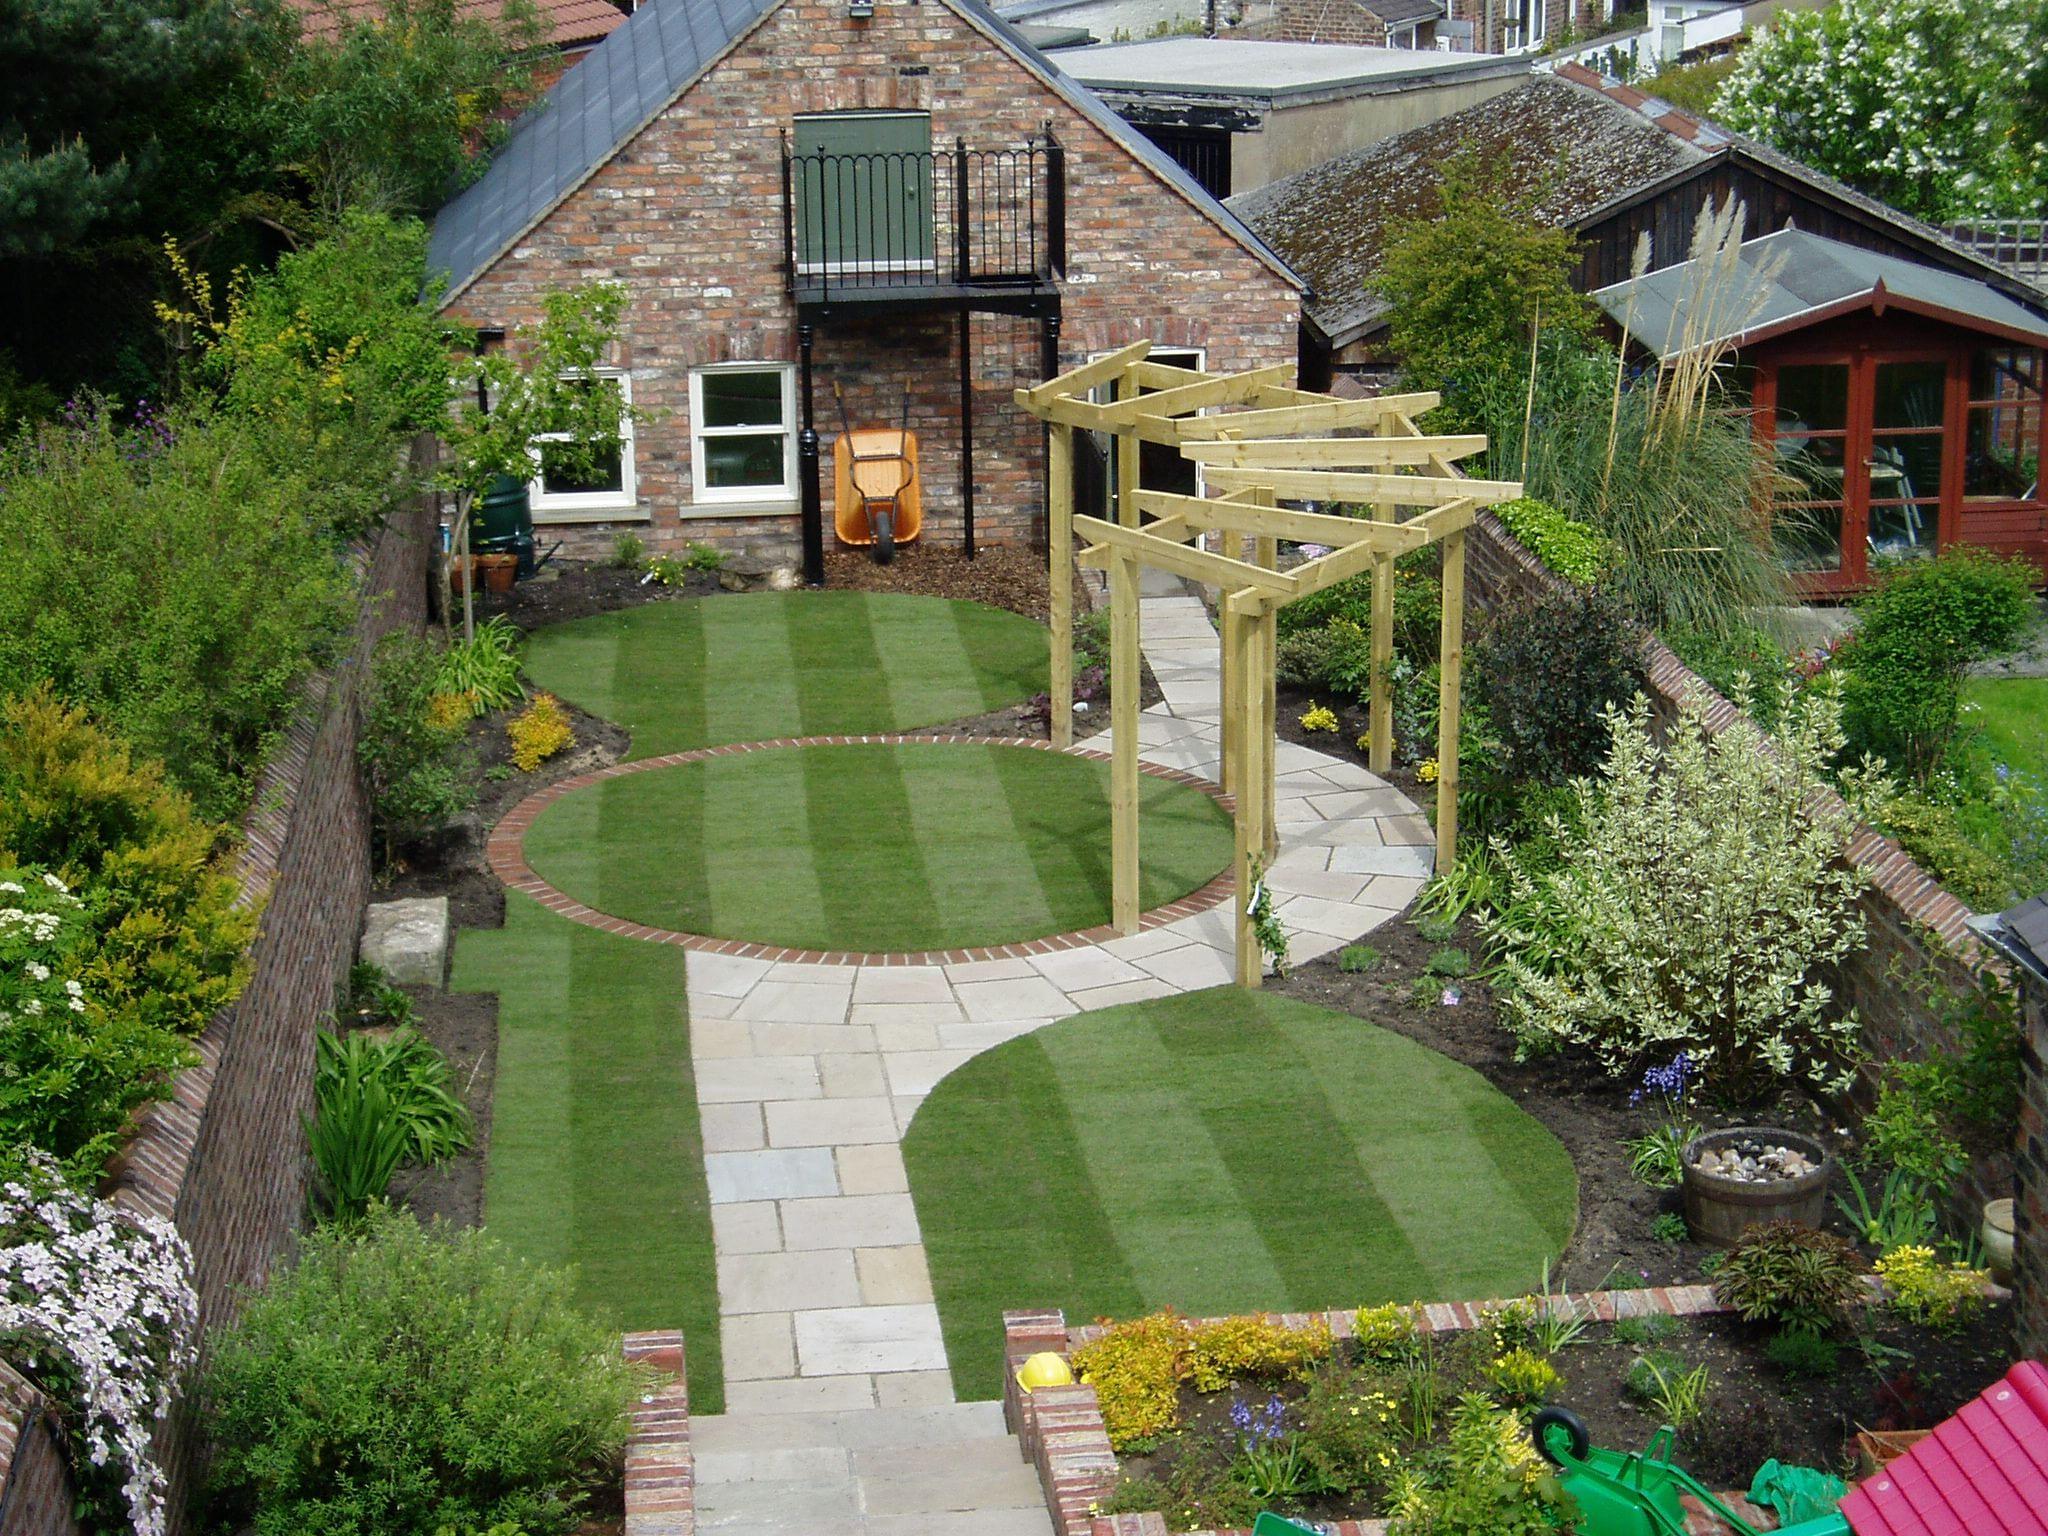 Simphome.com modern garden design ideas to try in 2020 2021 2022